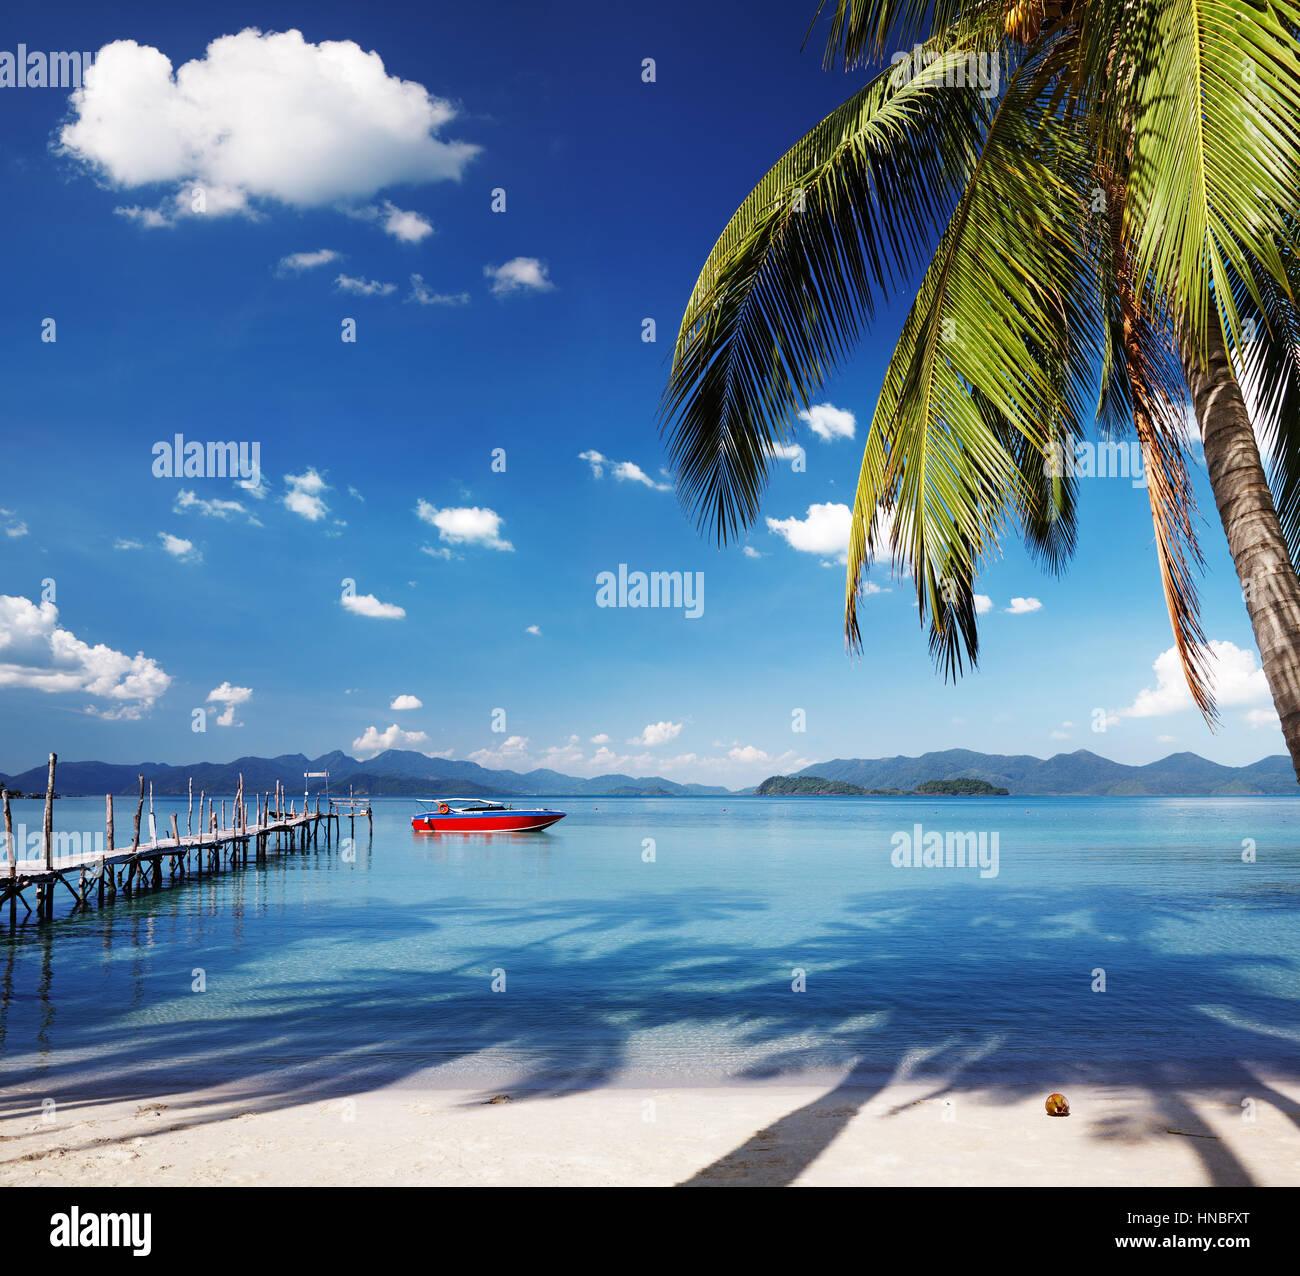 Isla Tropical, en algún lugar de Tailandia Imagen De Stock